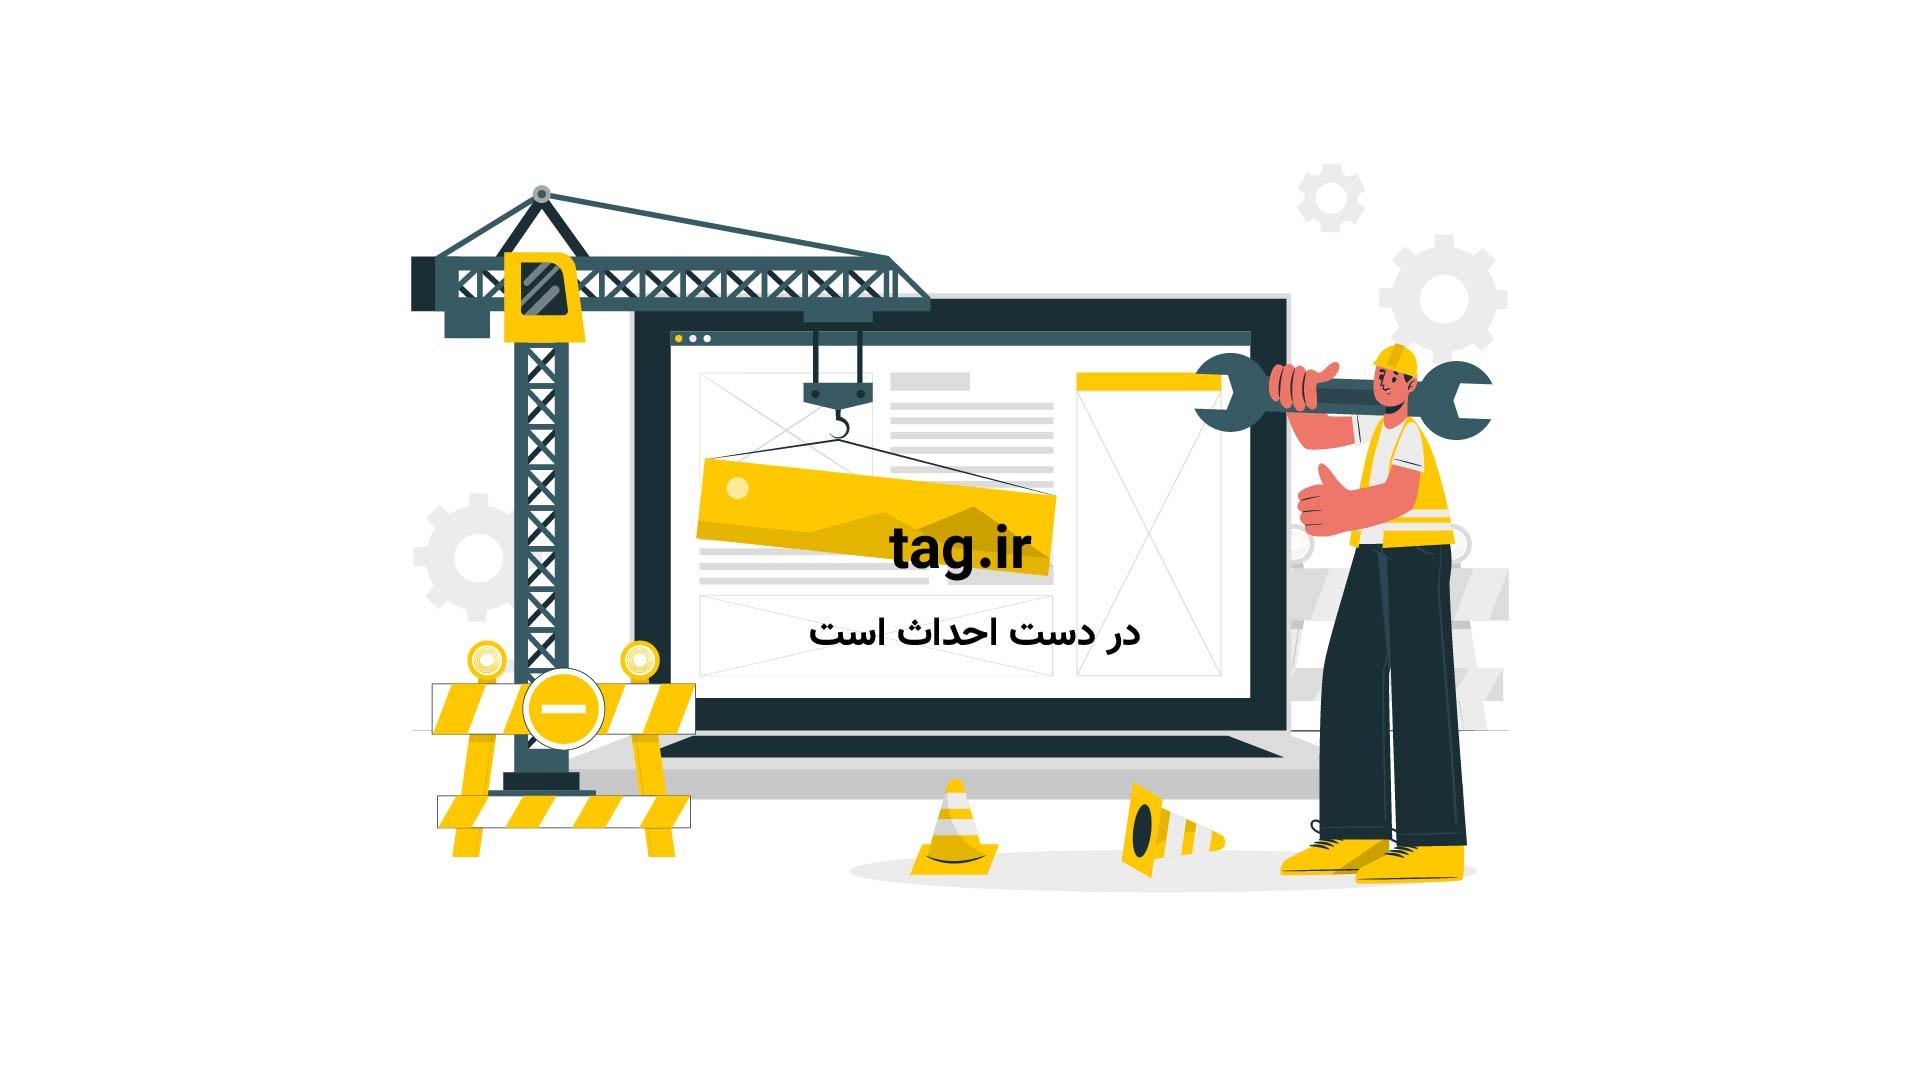 "سخنرانیهای تد؛ تکامل تدریجی و خطرناک ویروس ""اچ آی وی"" | فیلم"